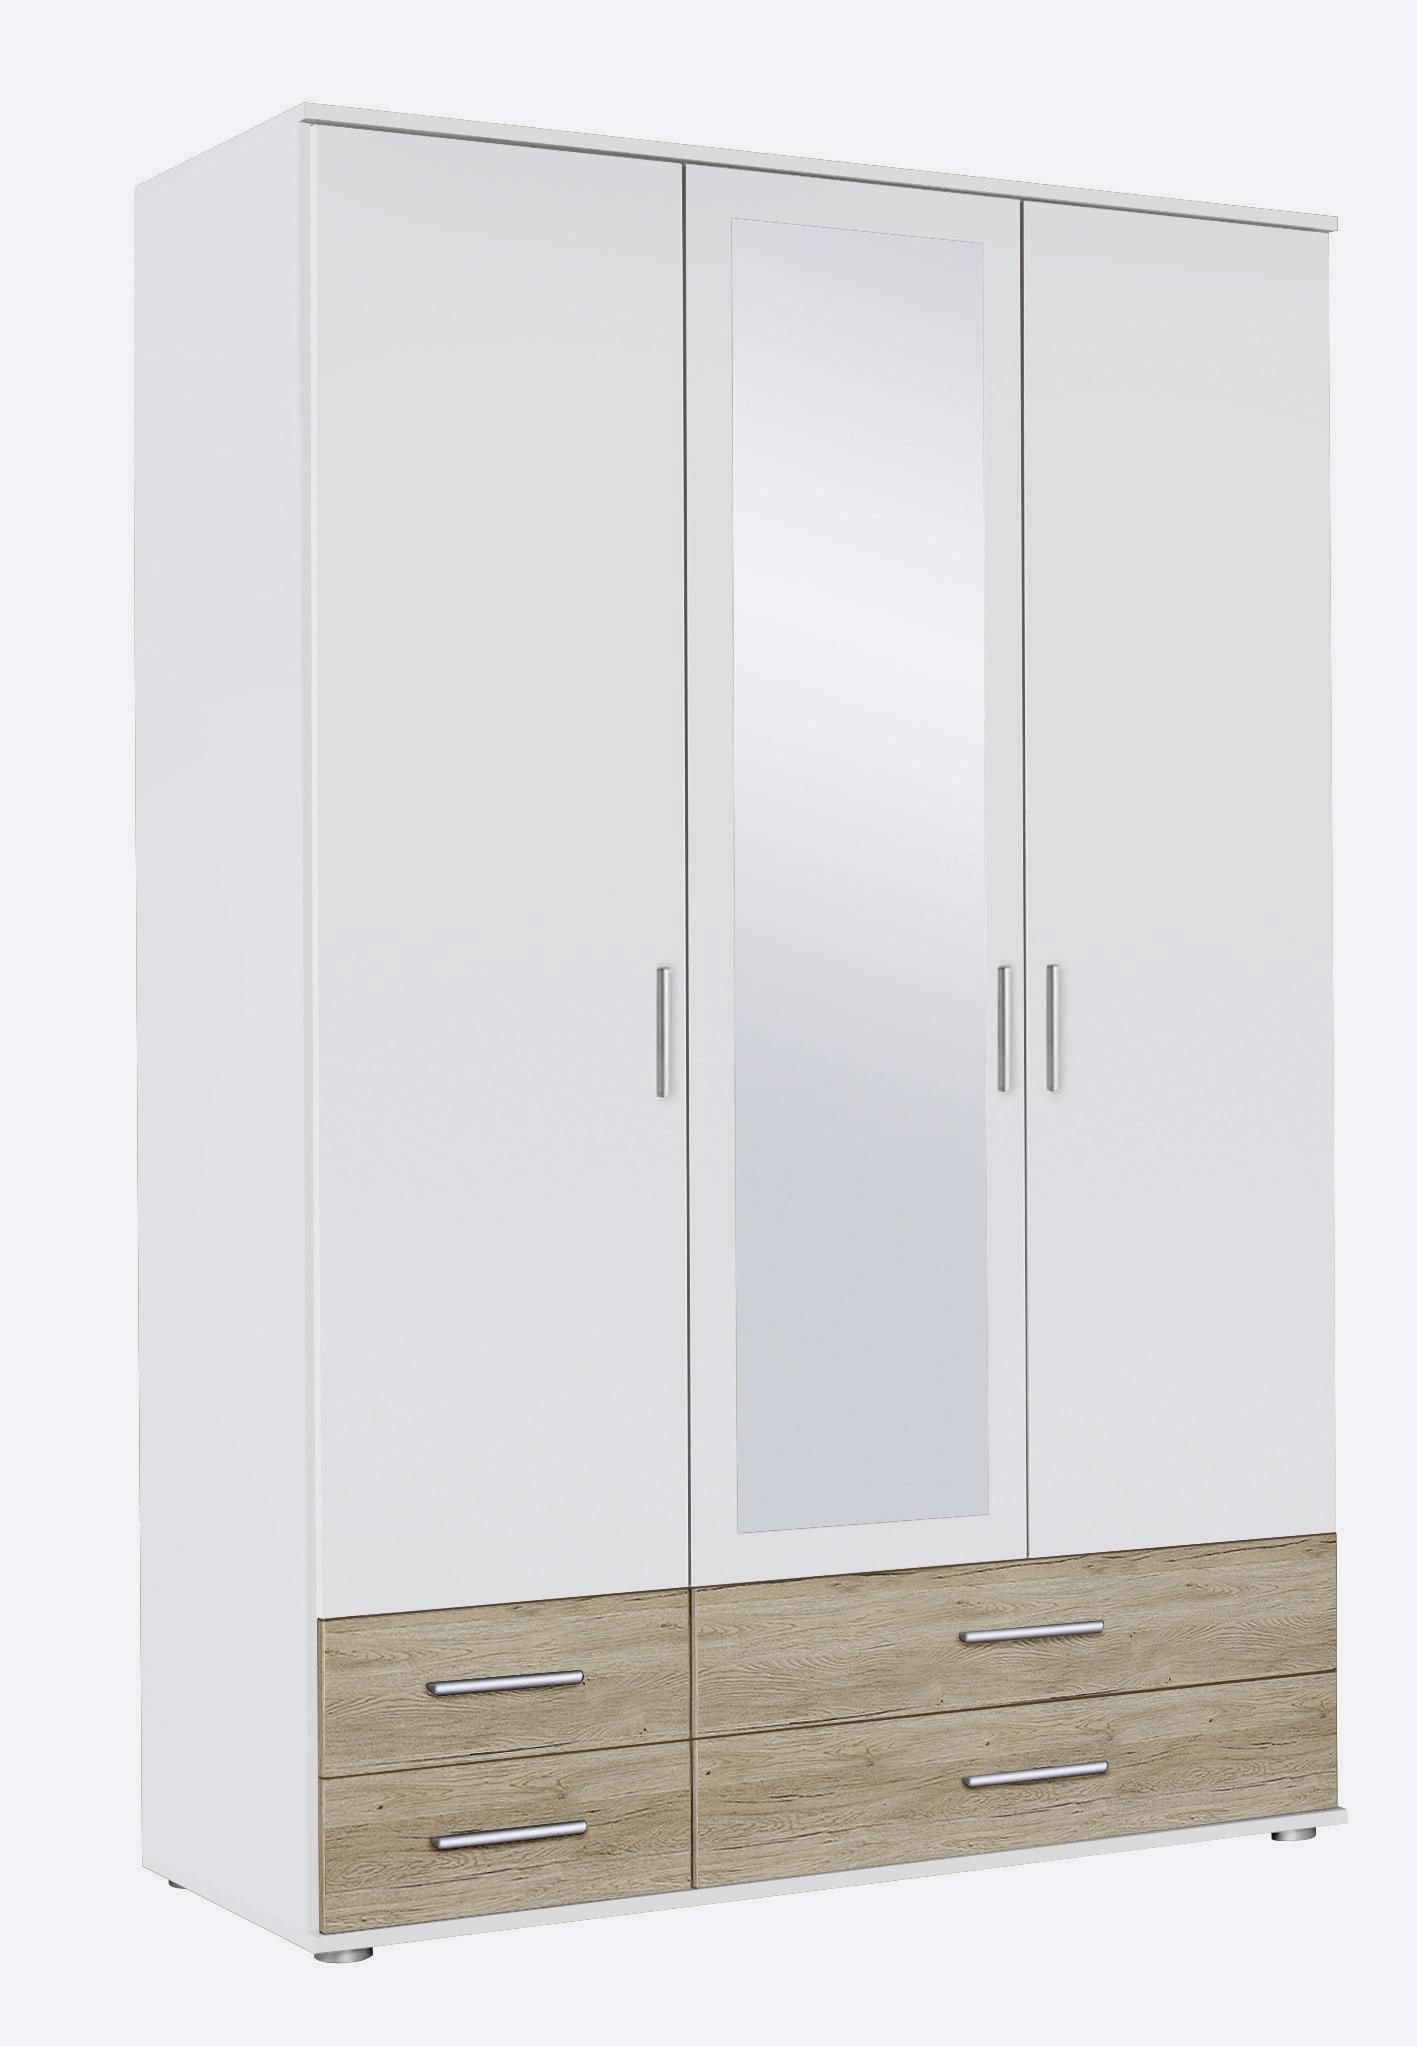 Armoire contemporaine 127 cm blanc/chêne Lazaro